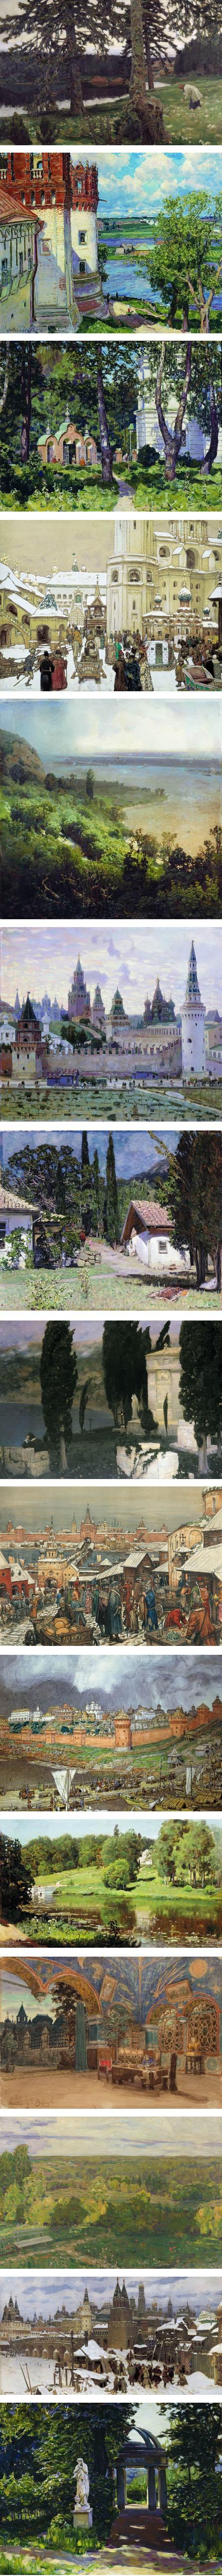 Apollinary Vasnetsov, Russian landscape painter, Mostoc history paintings